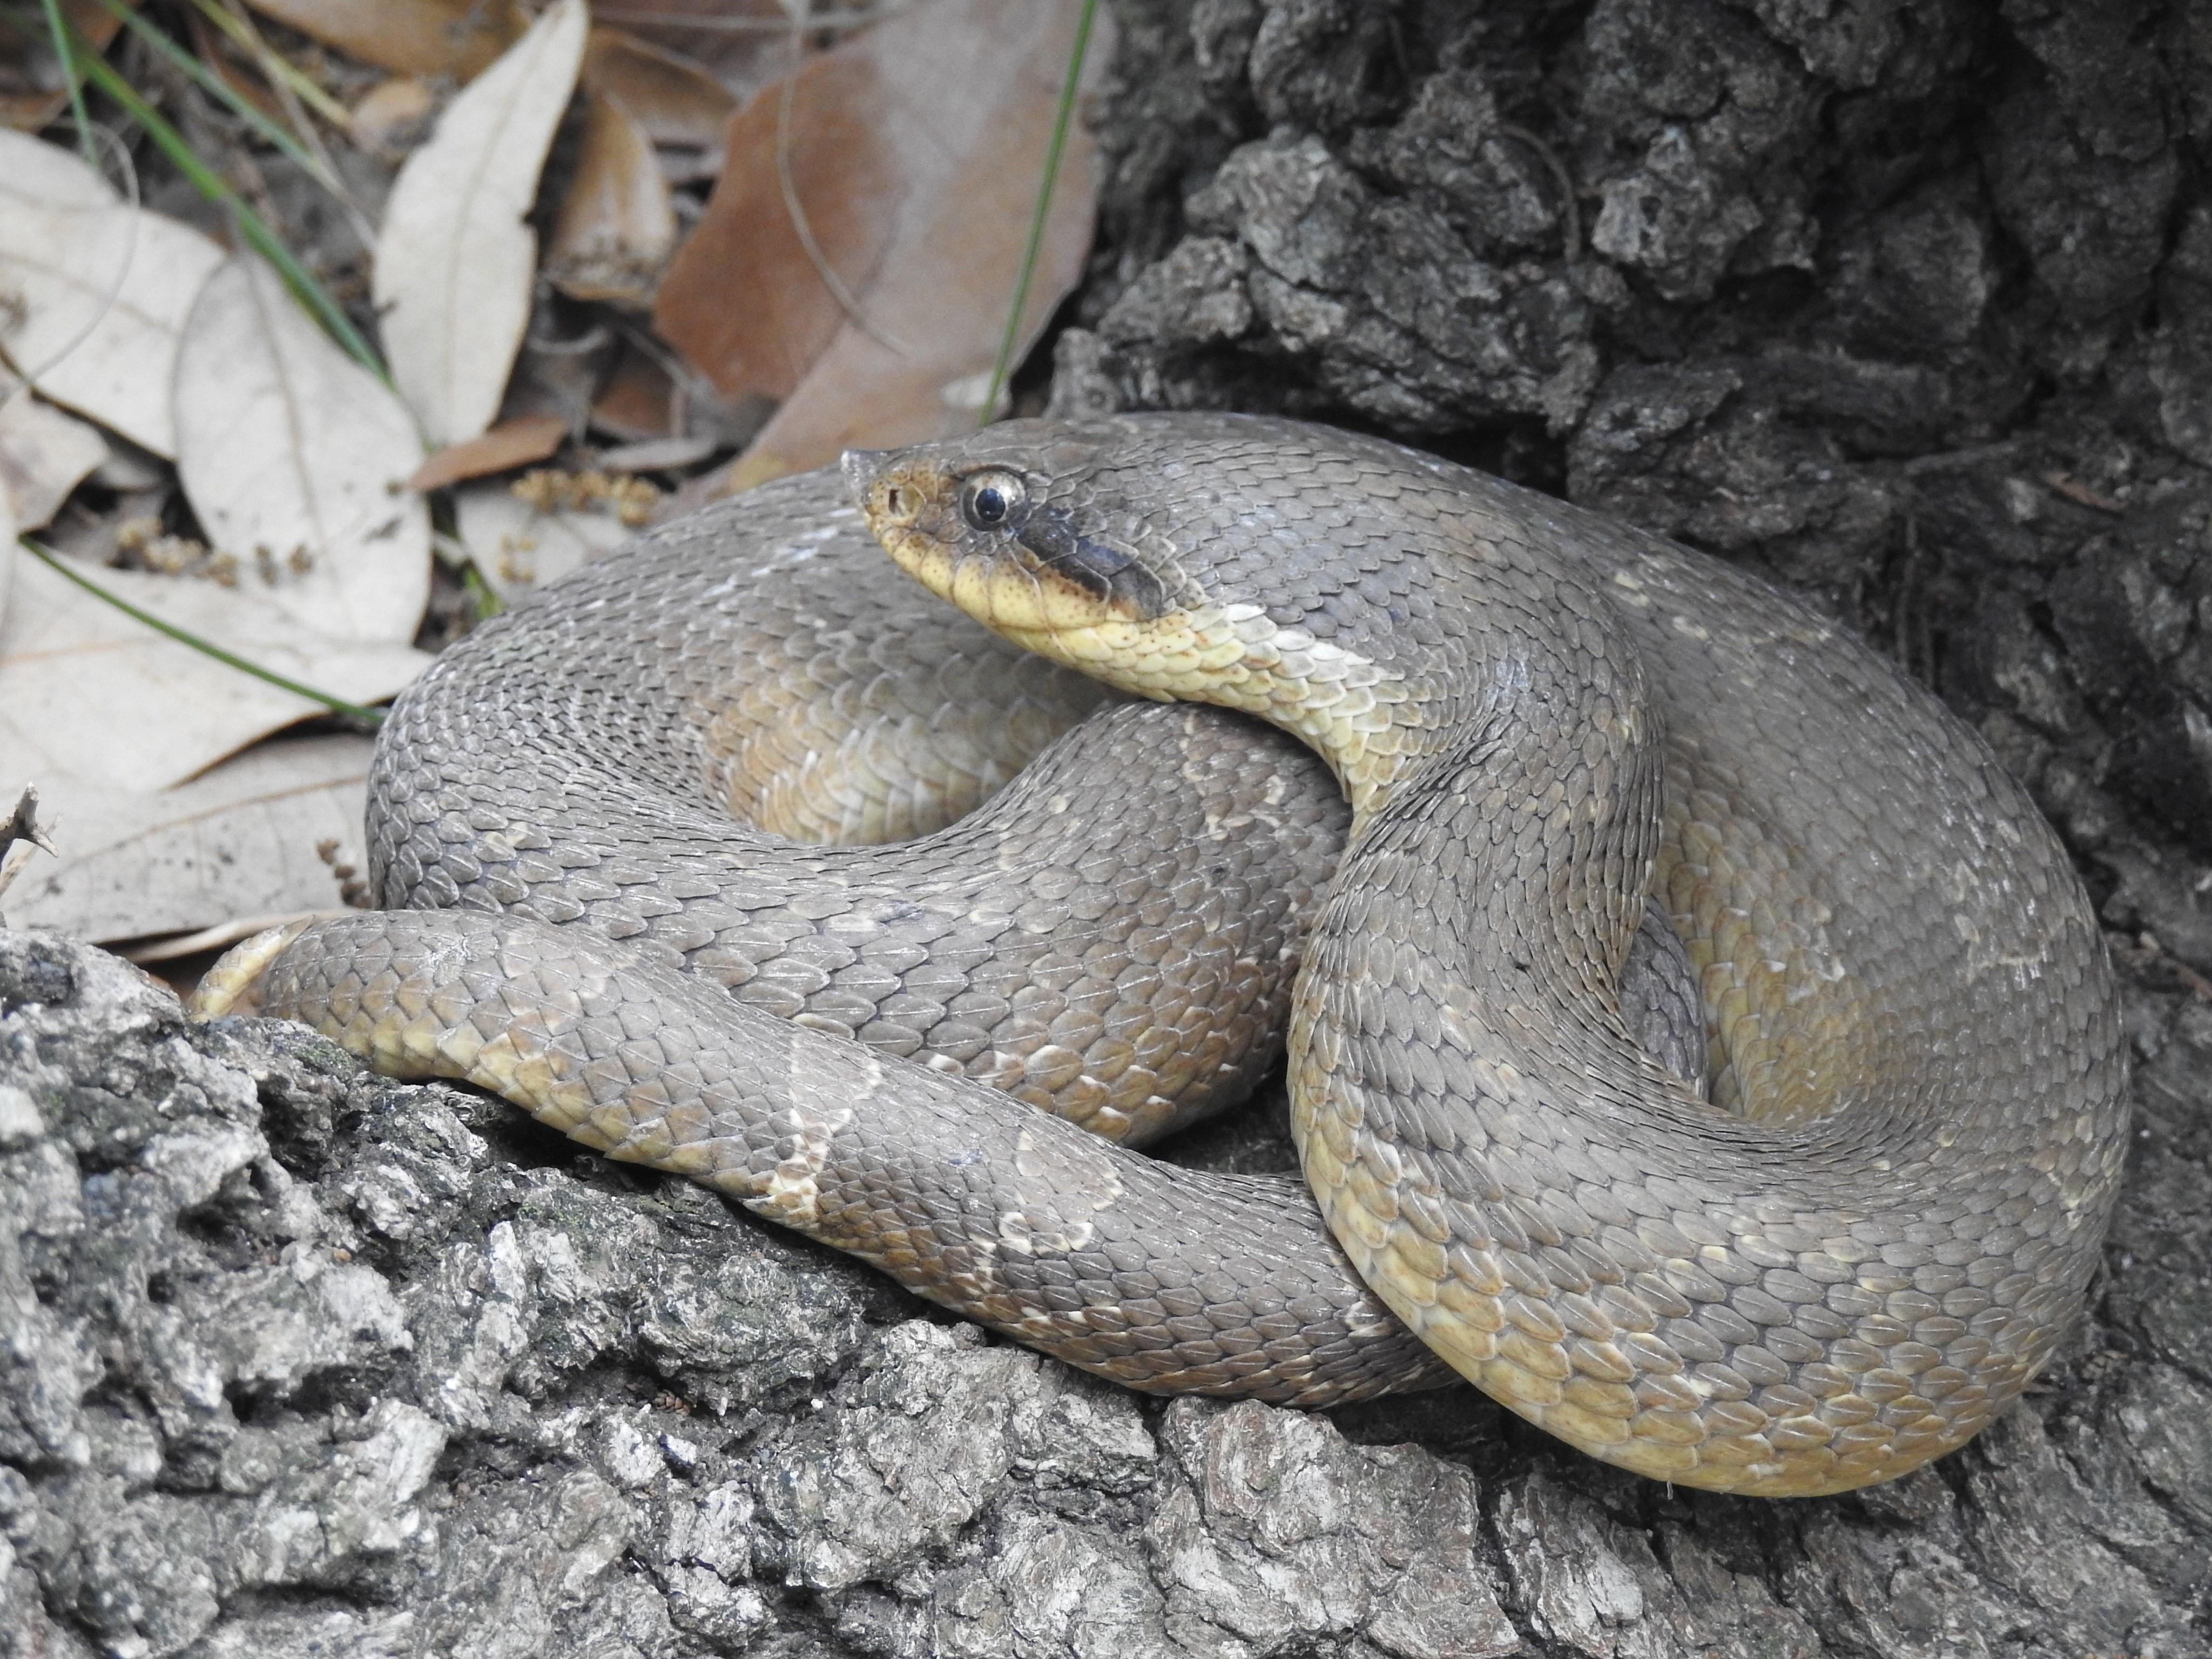 Eastern Hog-nosed Snake. Photo by Madison Torres.